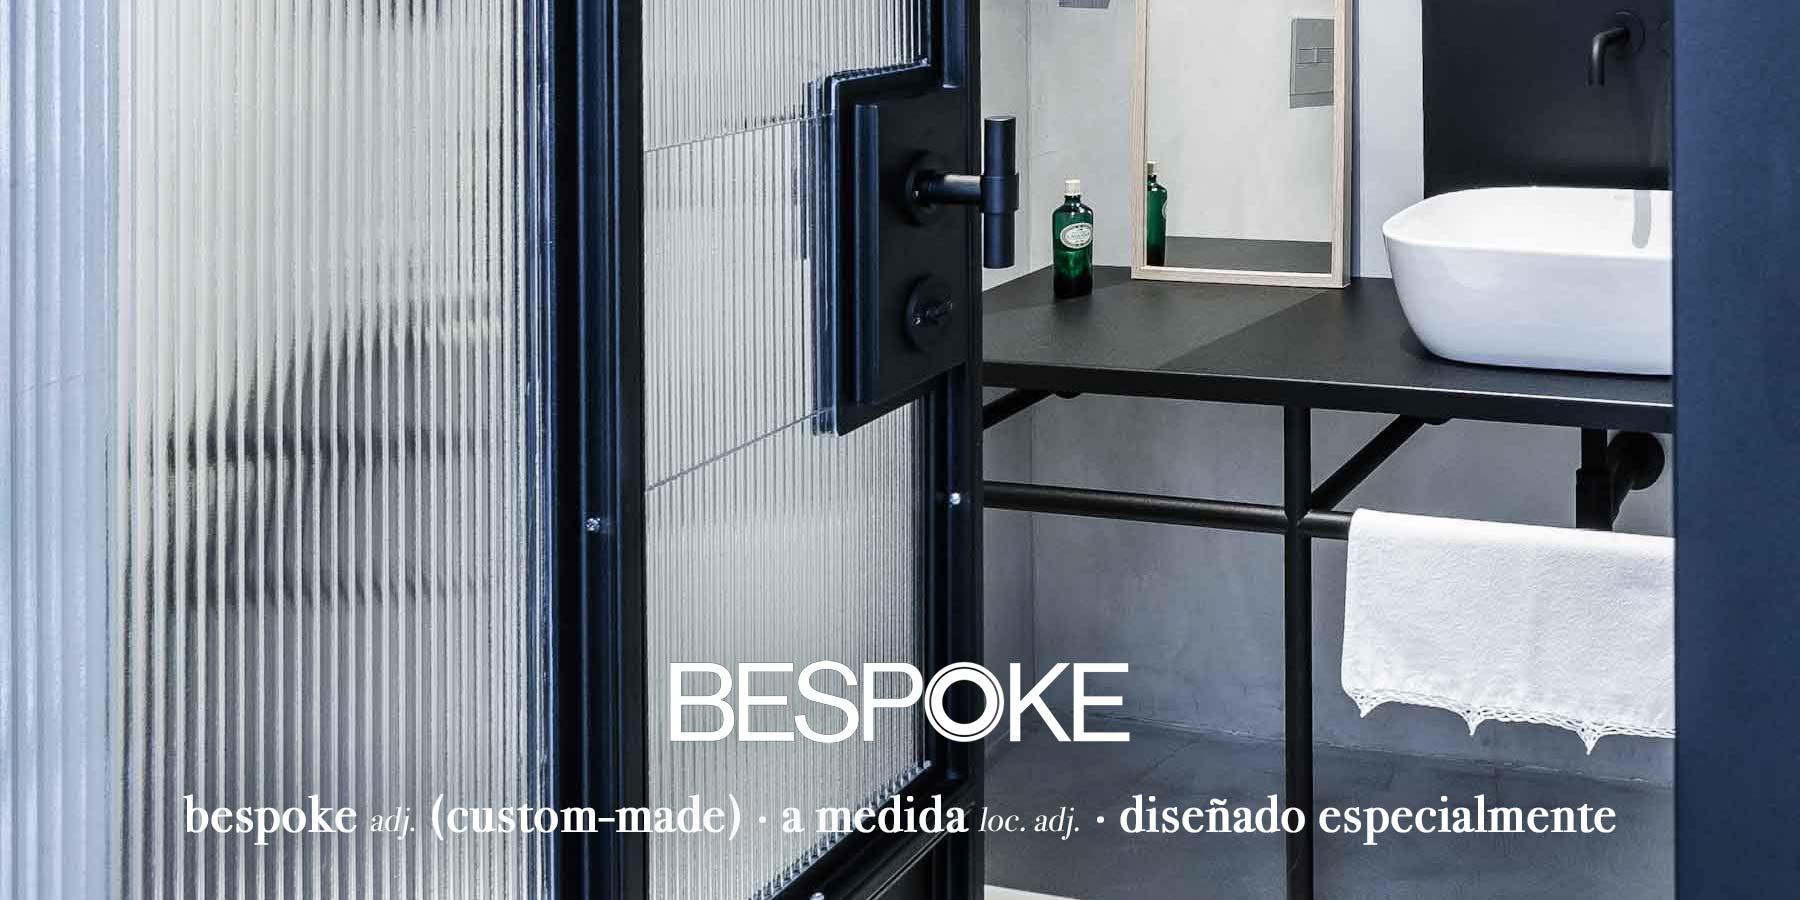 HOME_BESPOKE_CASA PATIO_03